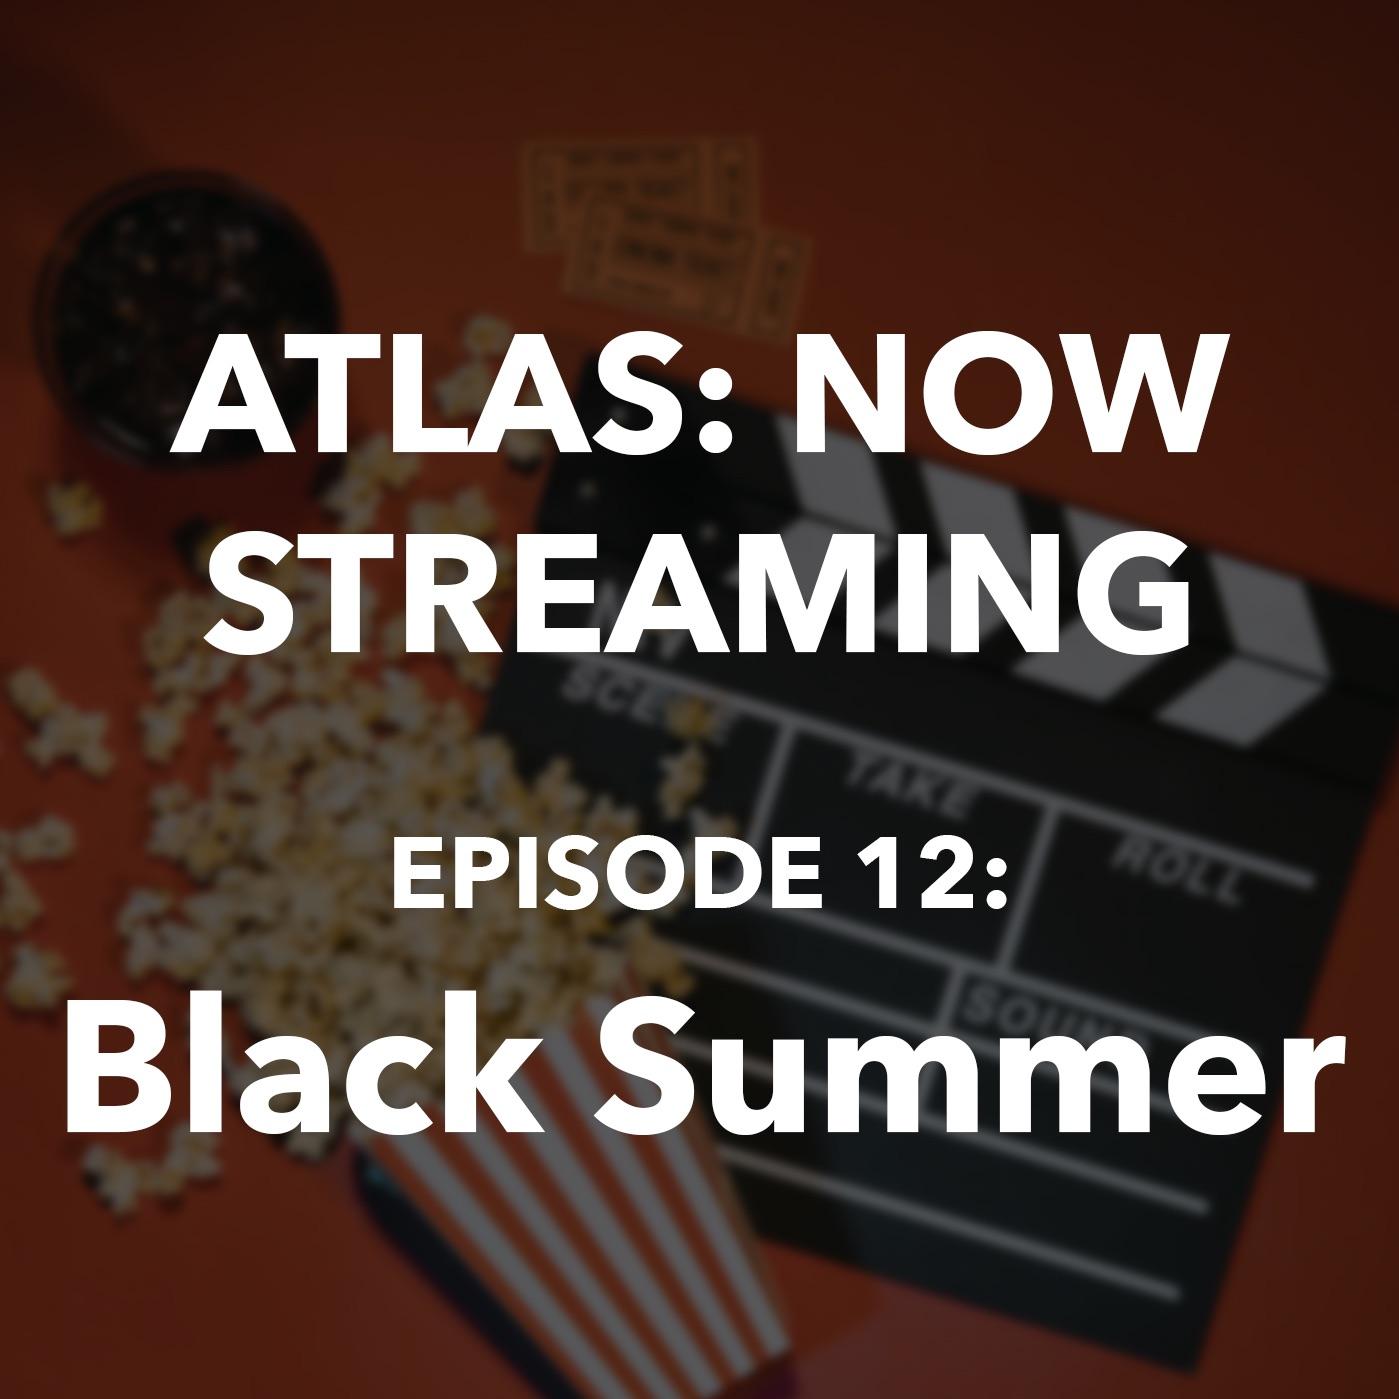 Atlas: Now Streaming Episode 12 - Black Summer